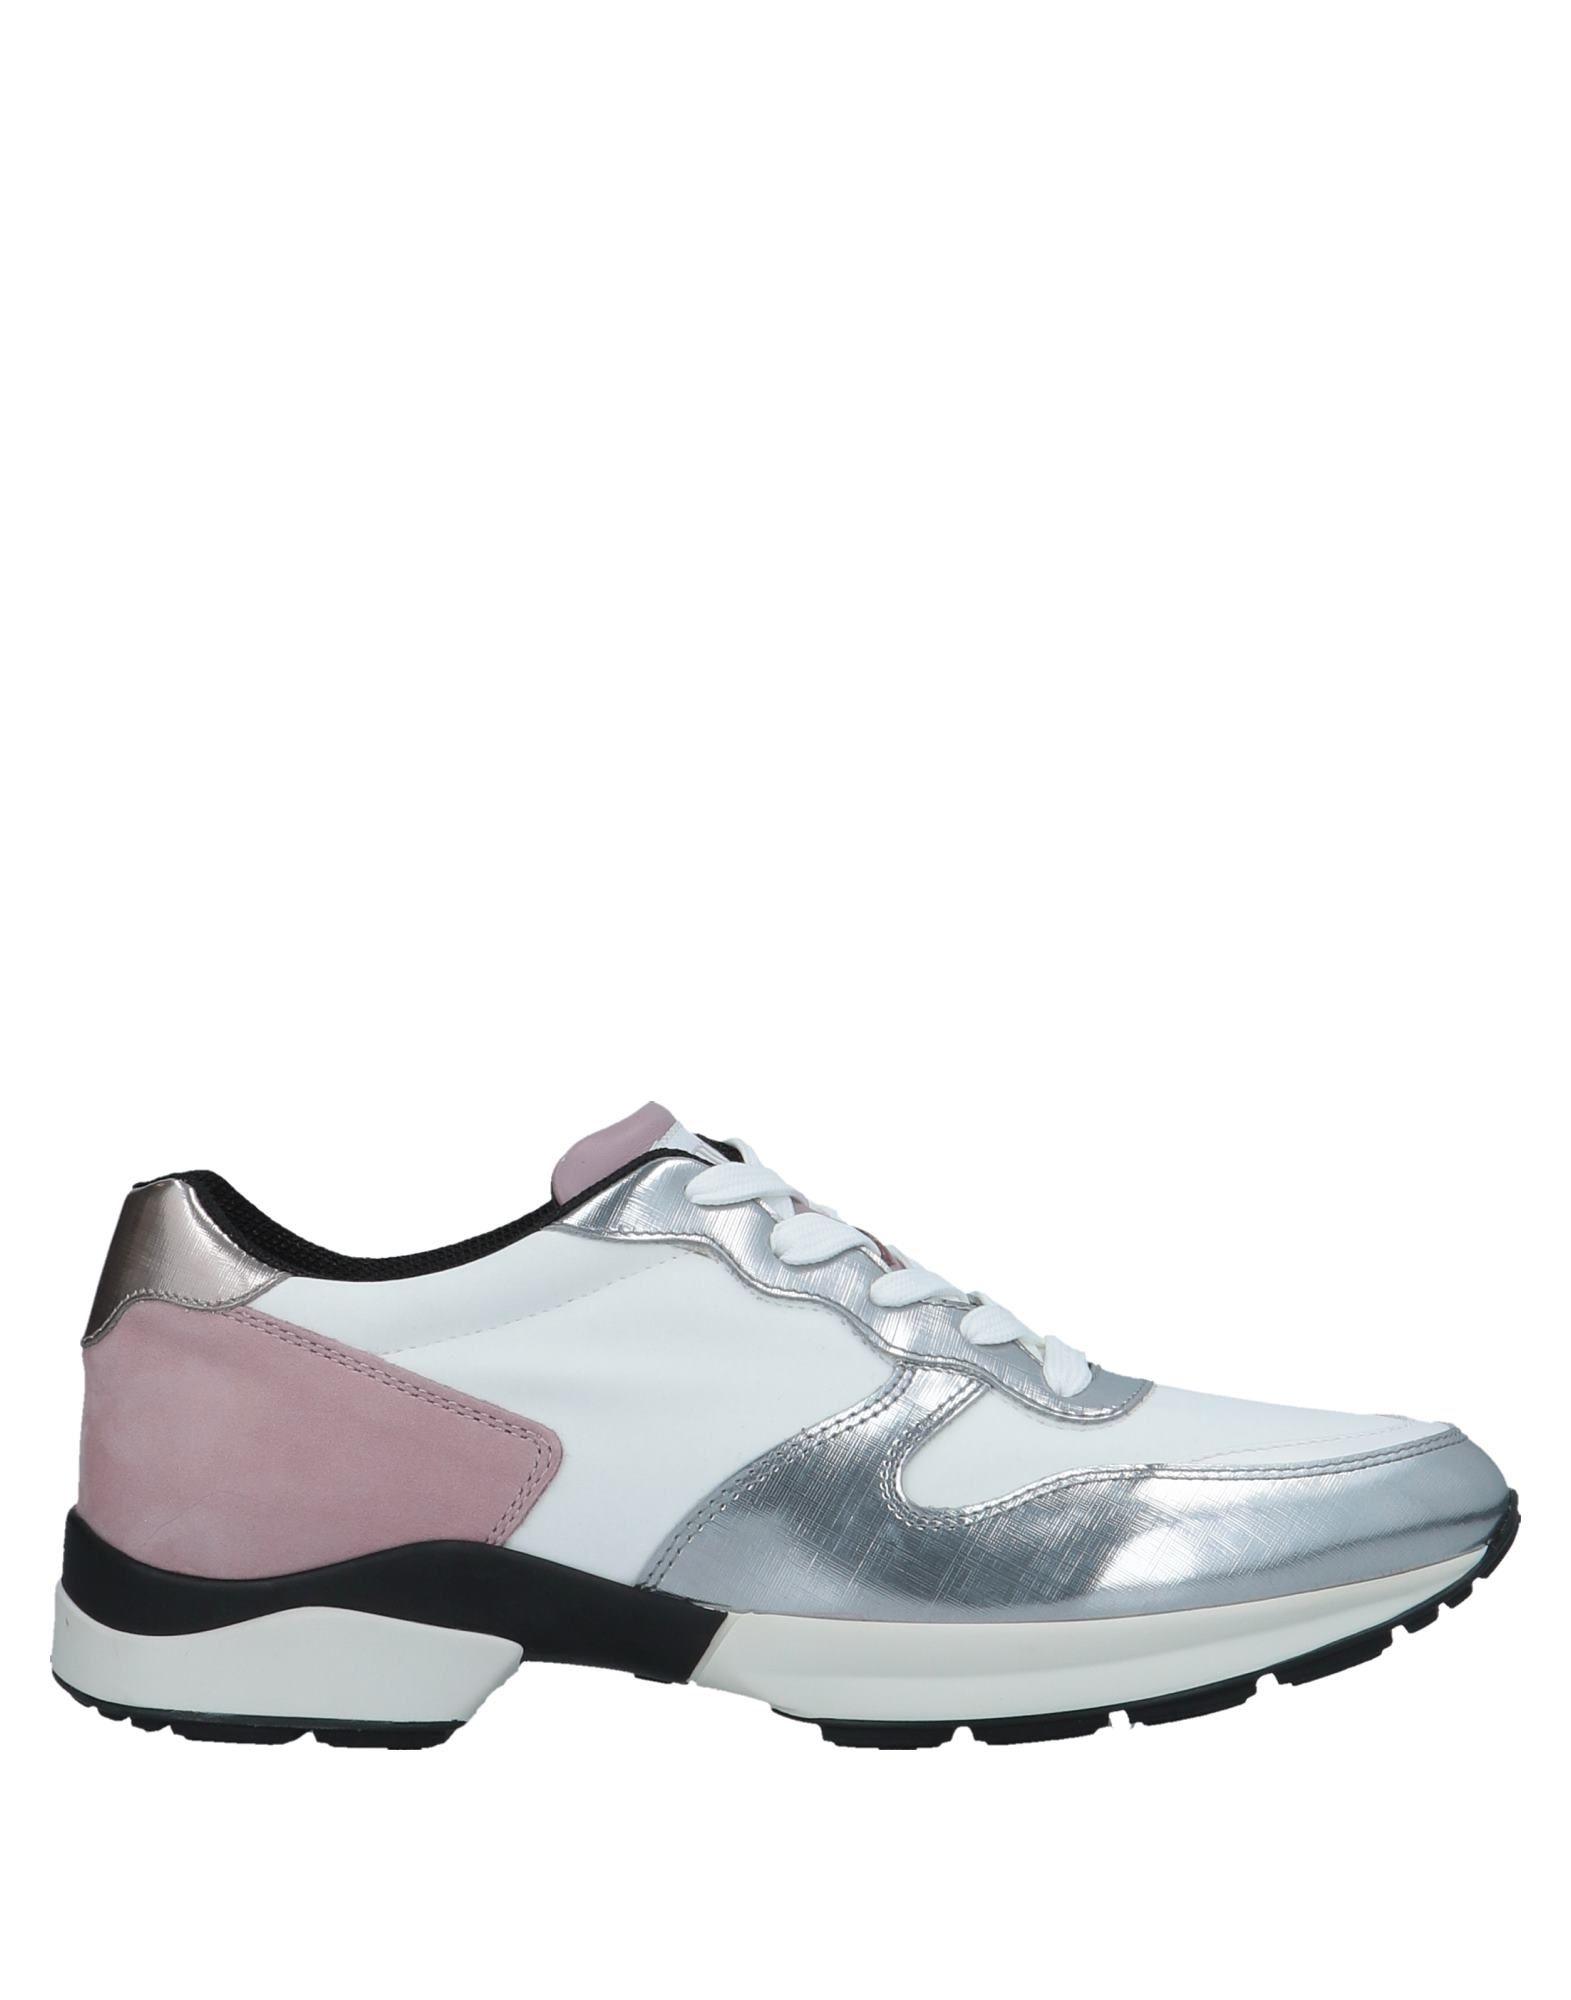 Rabatt Tod's Schuhe Tod's Rabatt Sneakers Damen  11542135RQ 7c3cb3